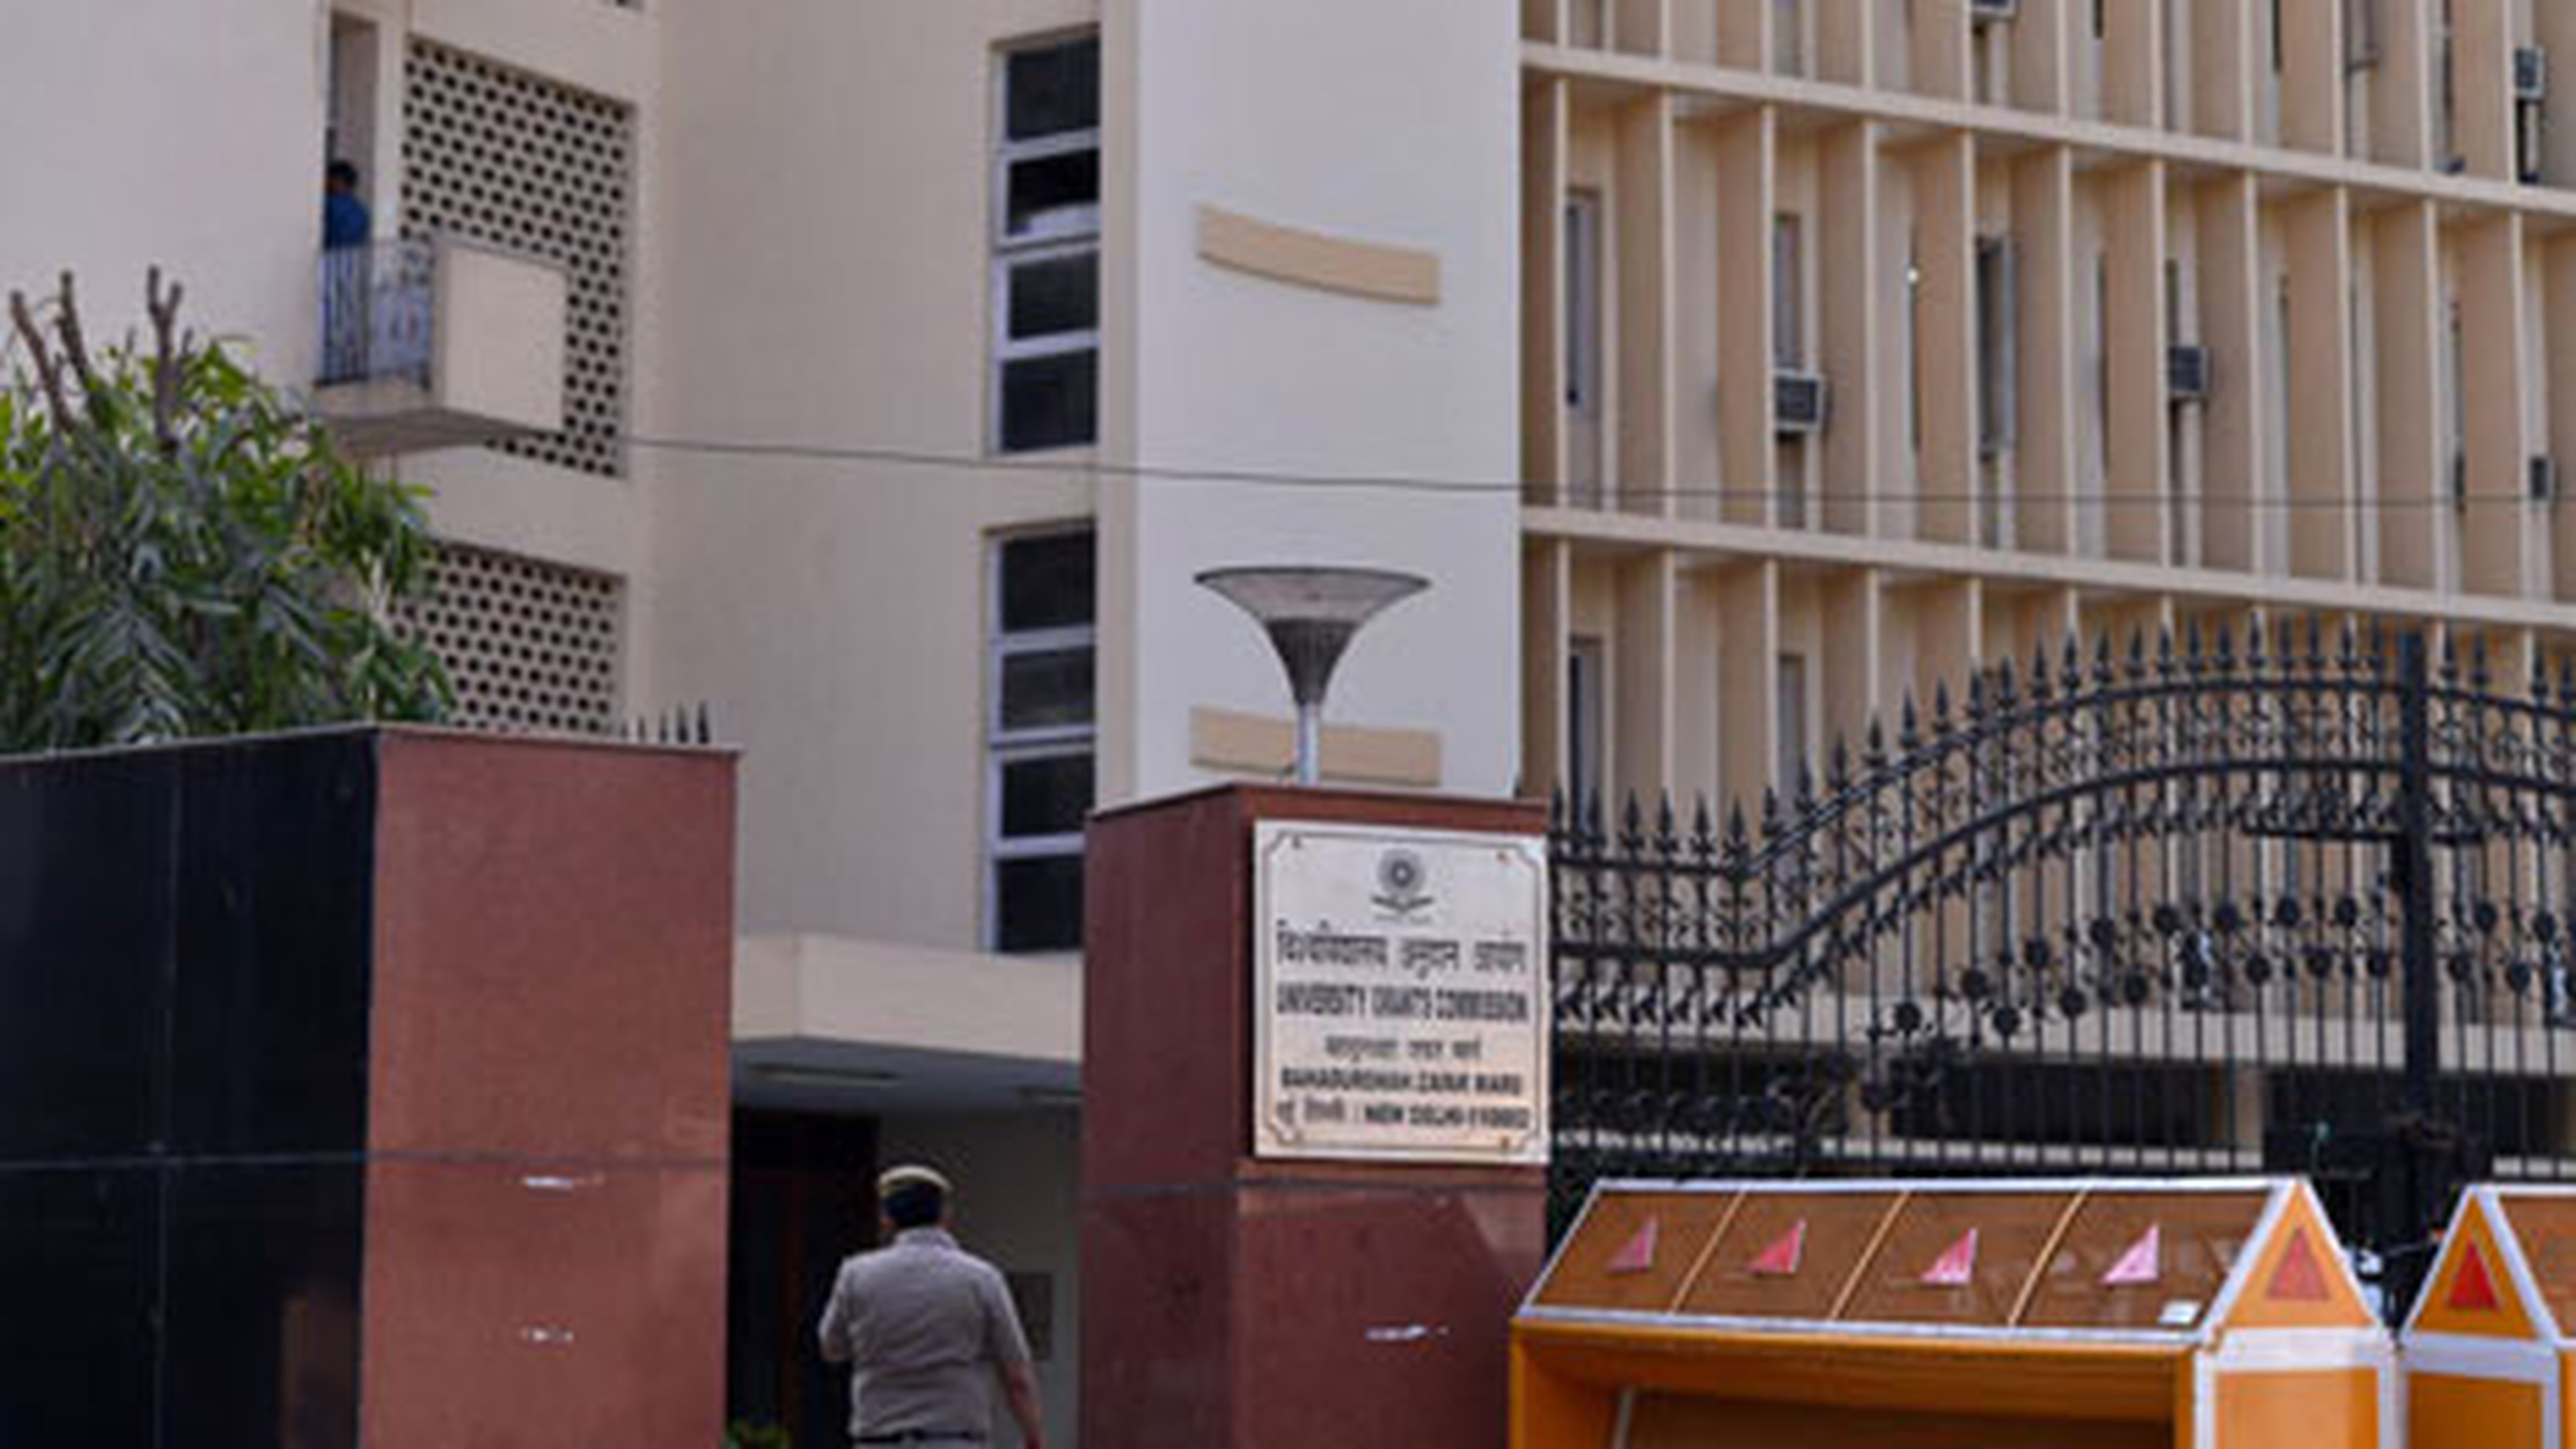 The UGC building in Delhi.